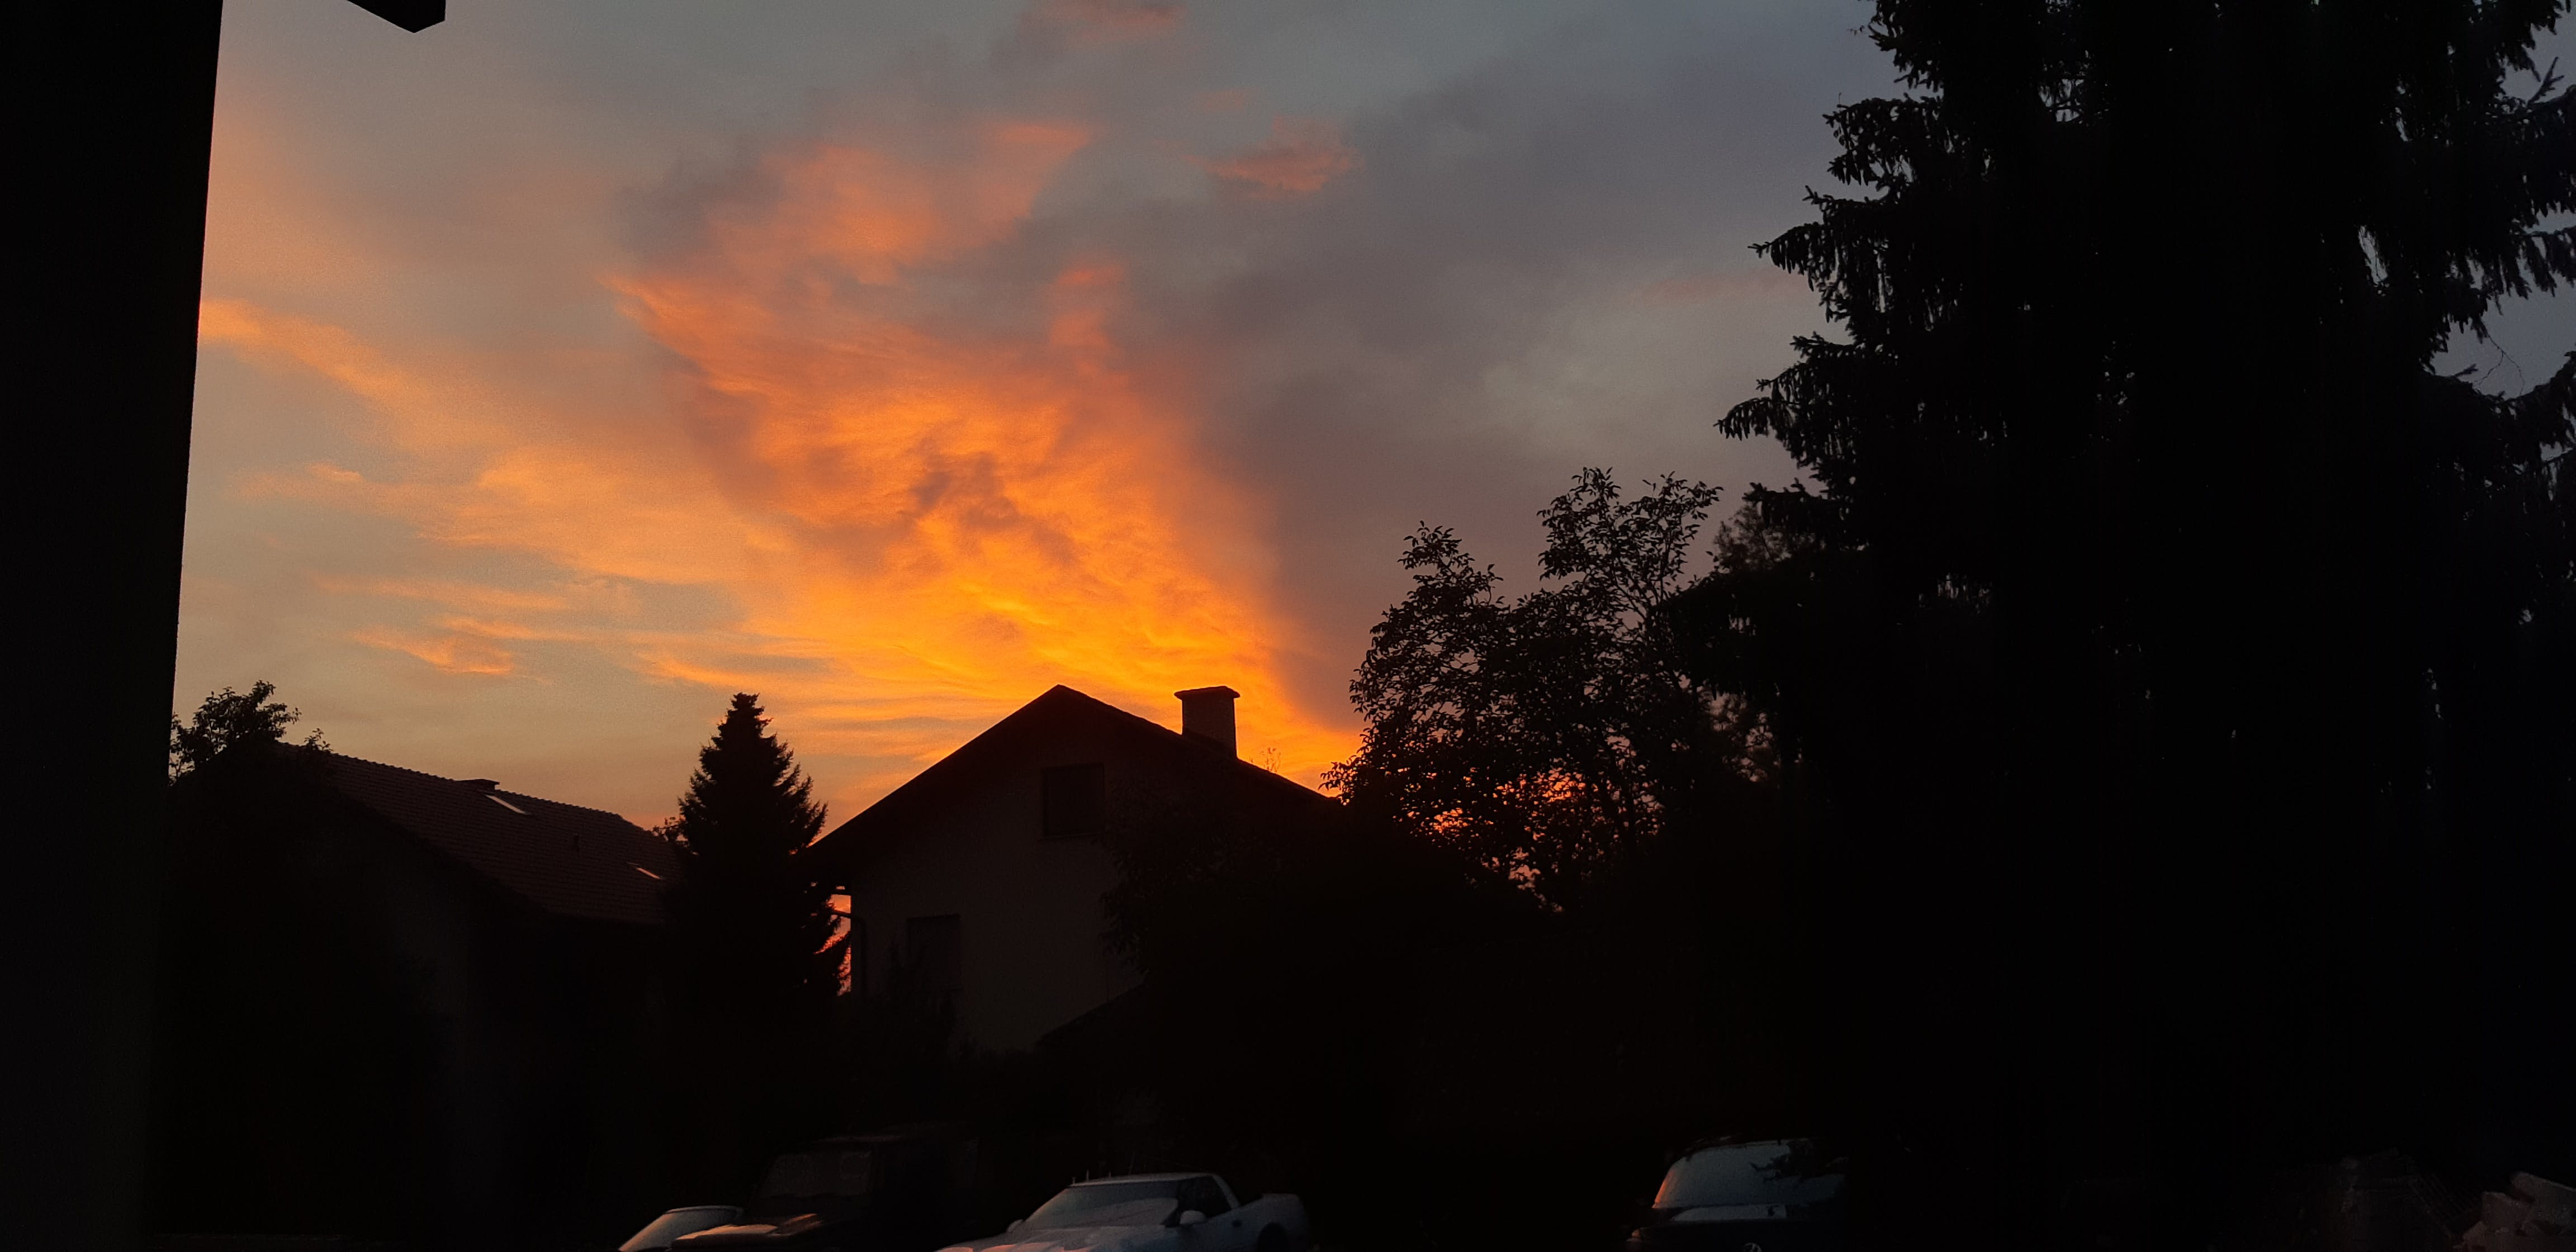 Kostenloses Stock Foto zu sonnenuntergang, wolken